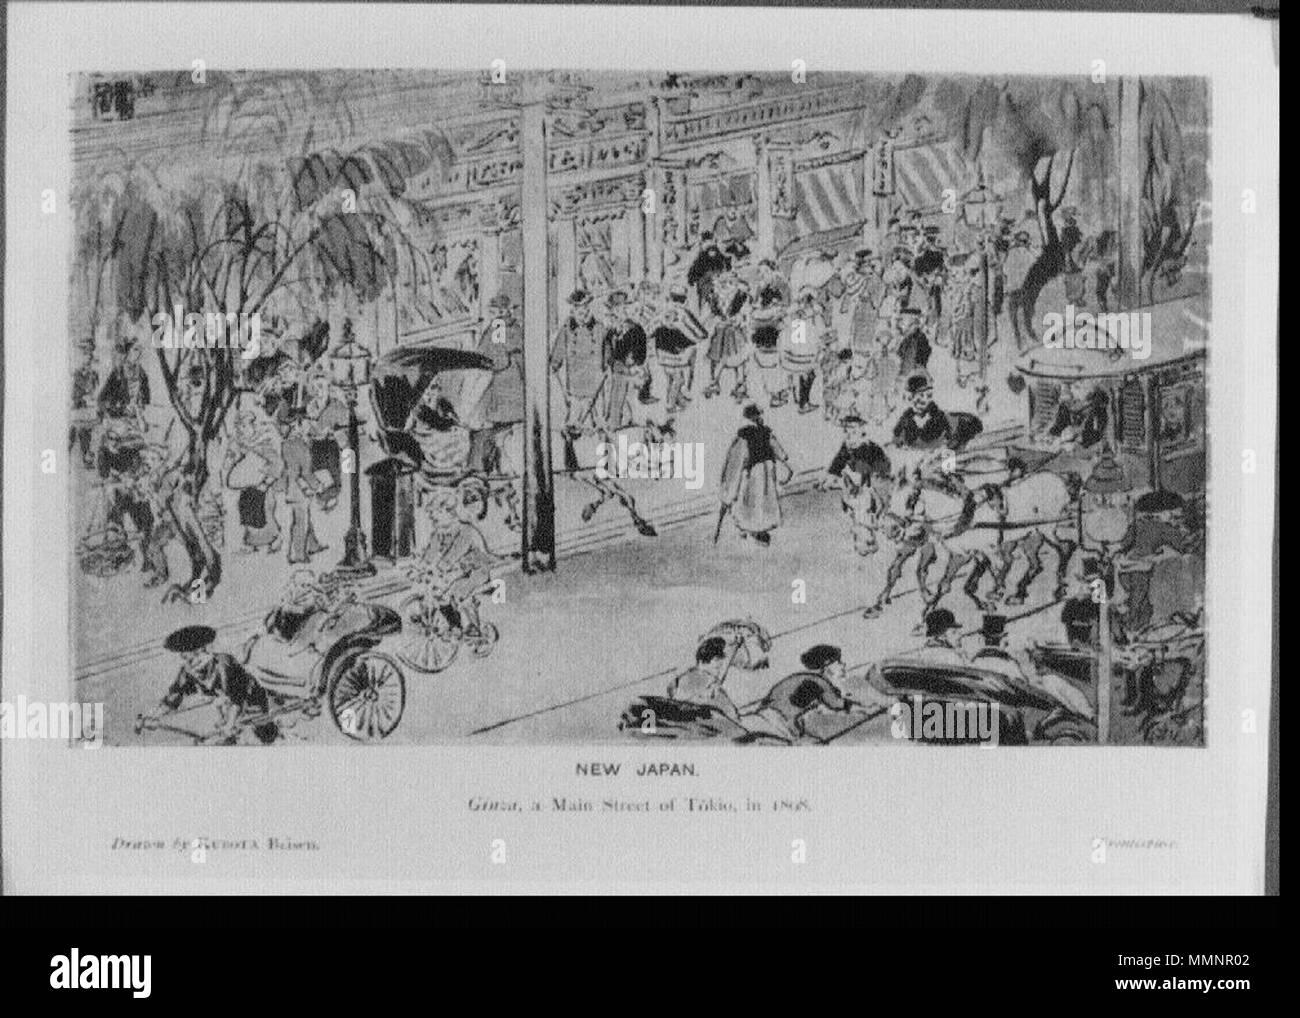 . ??ѵ??ެ?: ???????????ѵ???+????զ?????ئ??????????????????????????+??????1898զ? English: New Japan. Ginza, a main street of Tokio, in 1898.  . 1899.   Kubota Beisen - The New Far East (1899) 01 Stock Photo